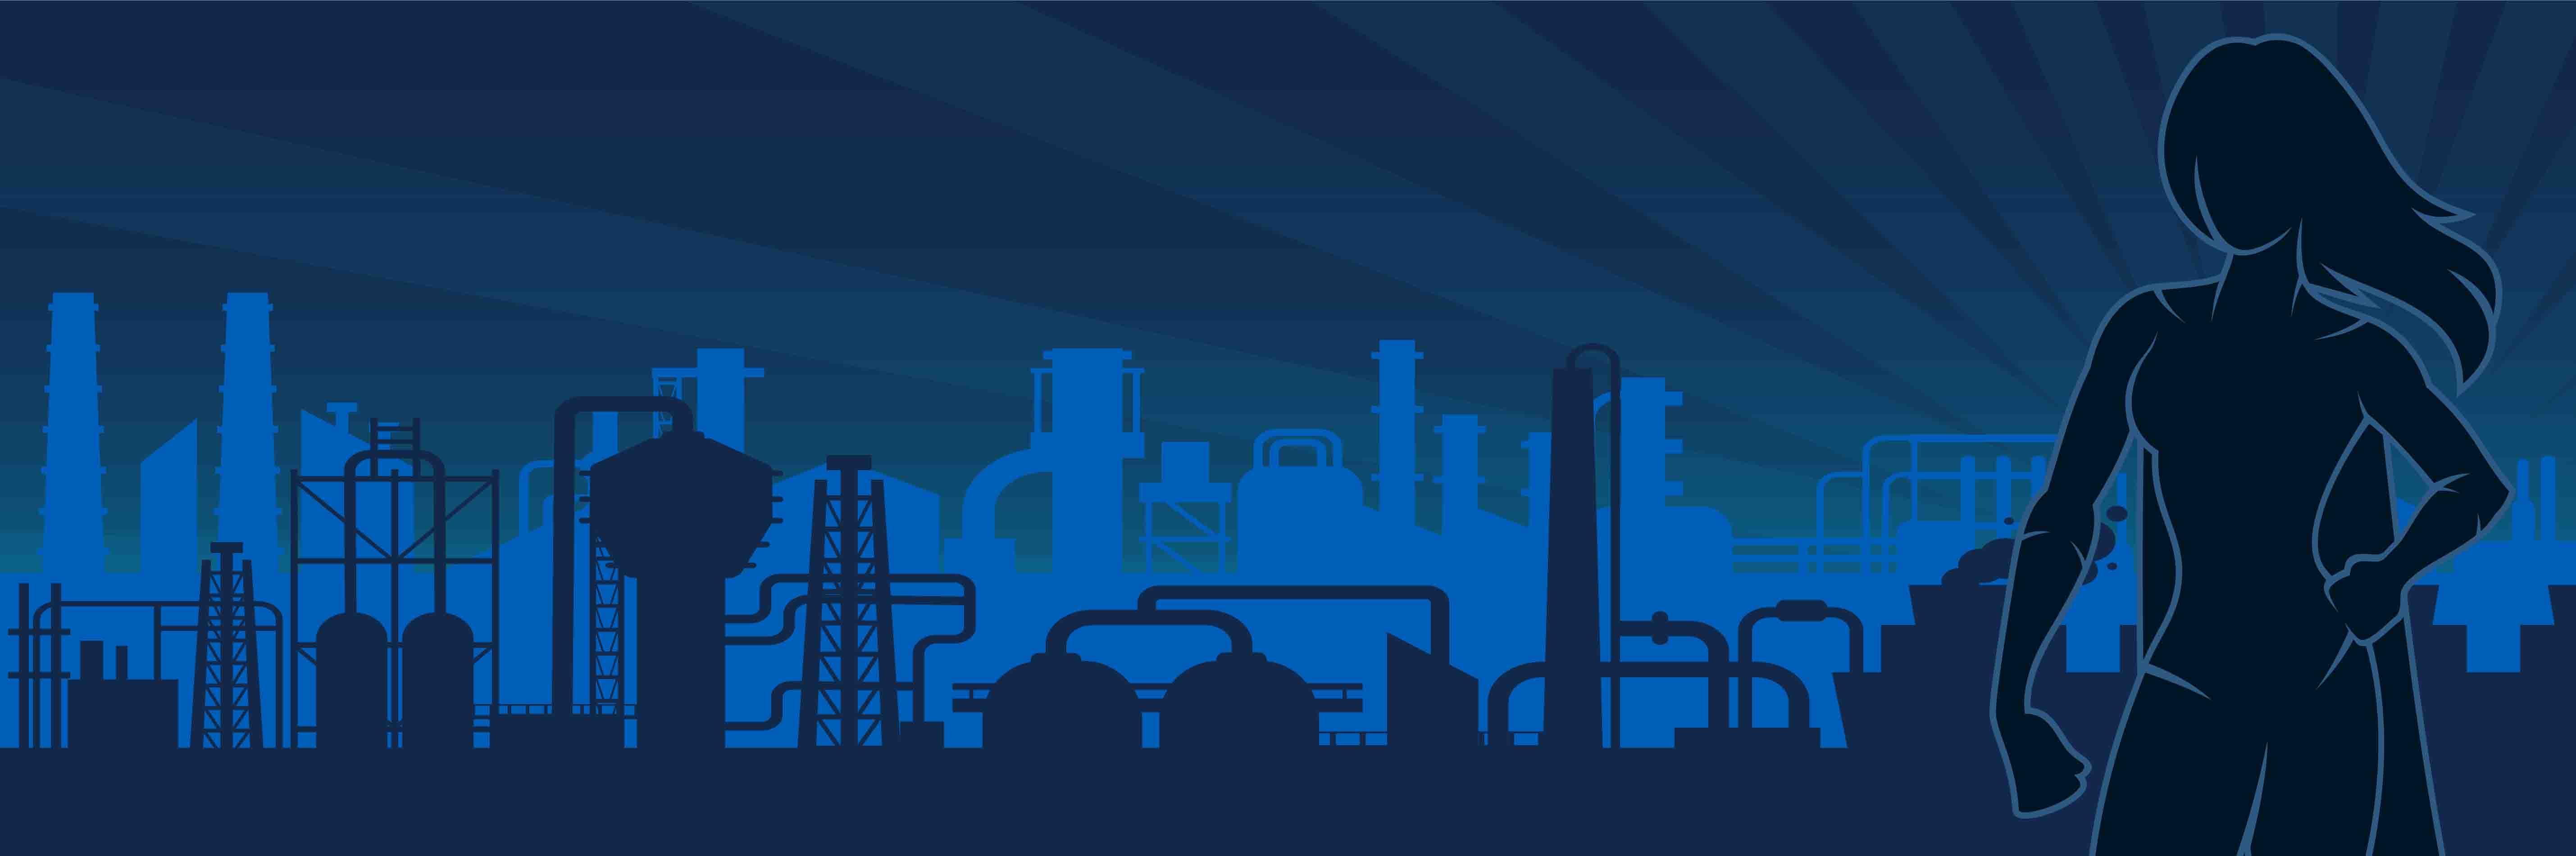 2020 User Conference | GE Digital | Industrial Superhero